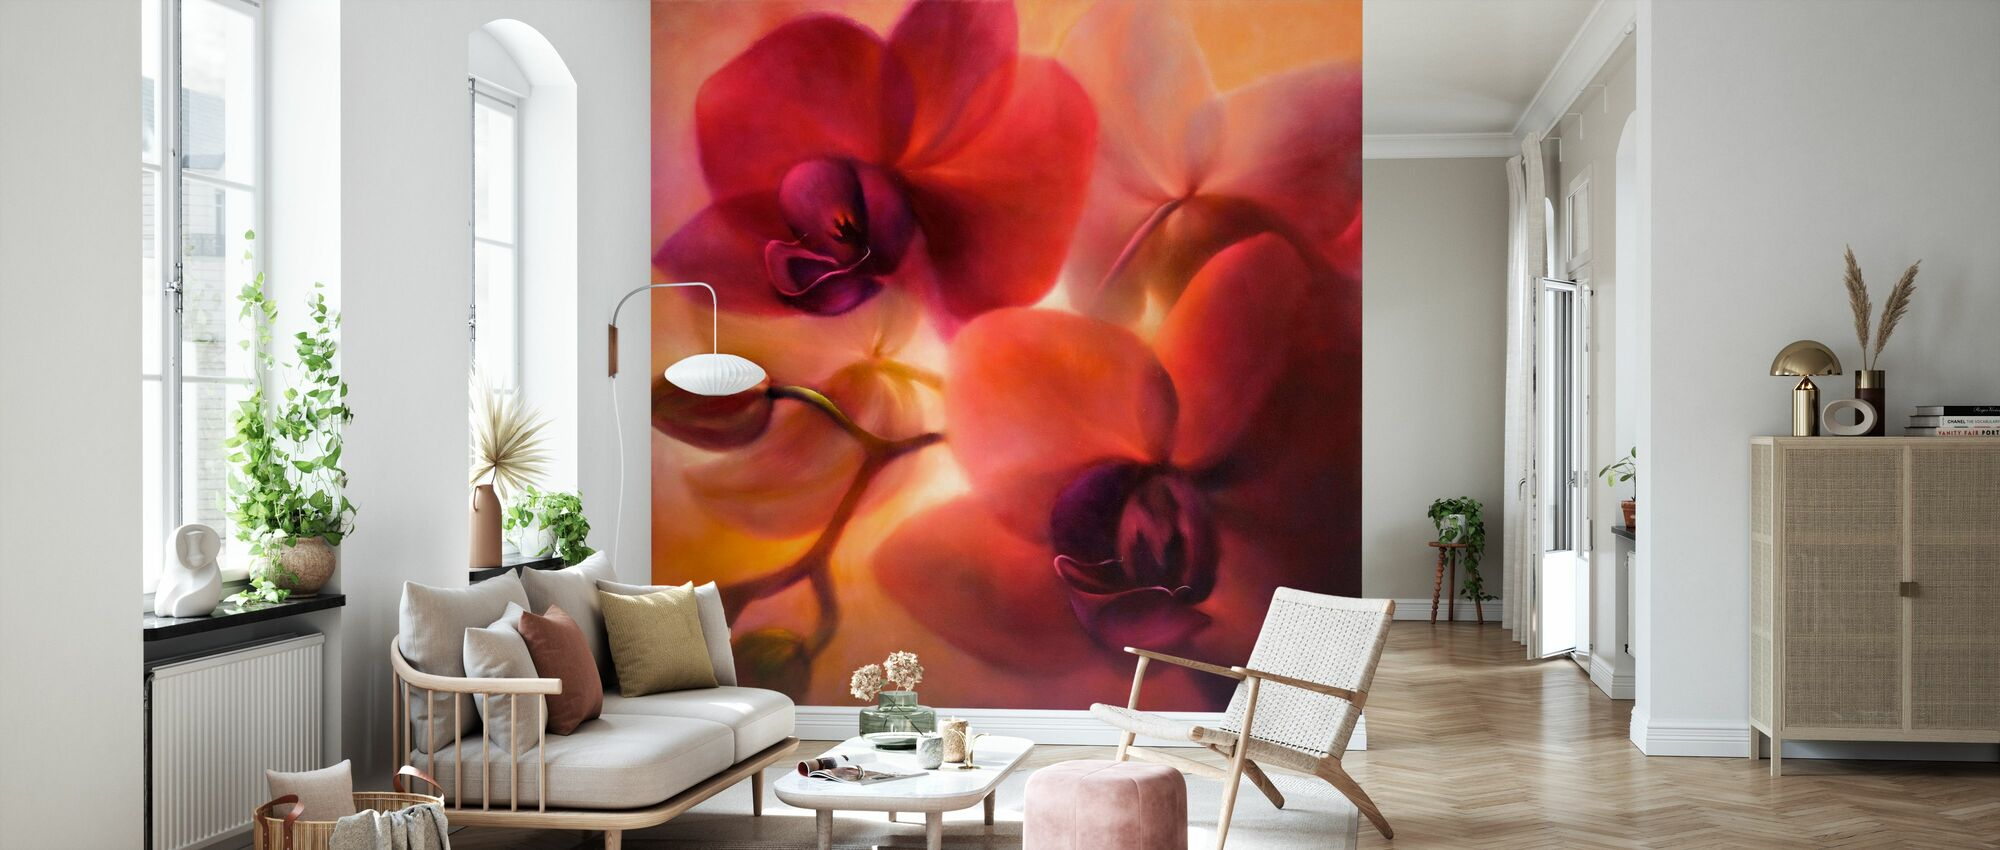 Orchids - Wallpaper - Living Room